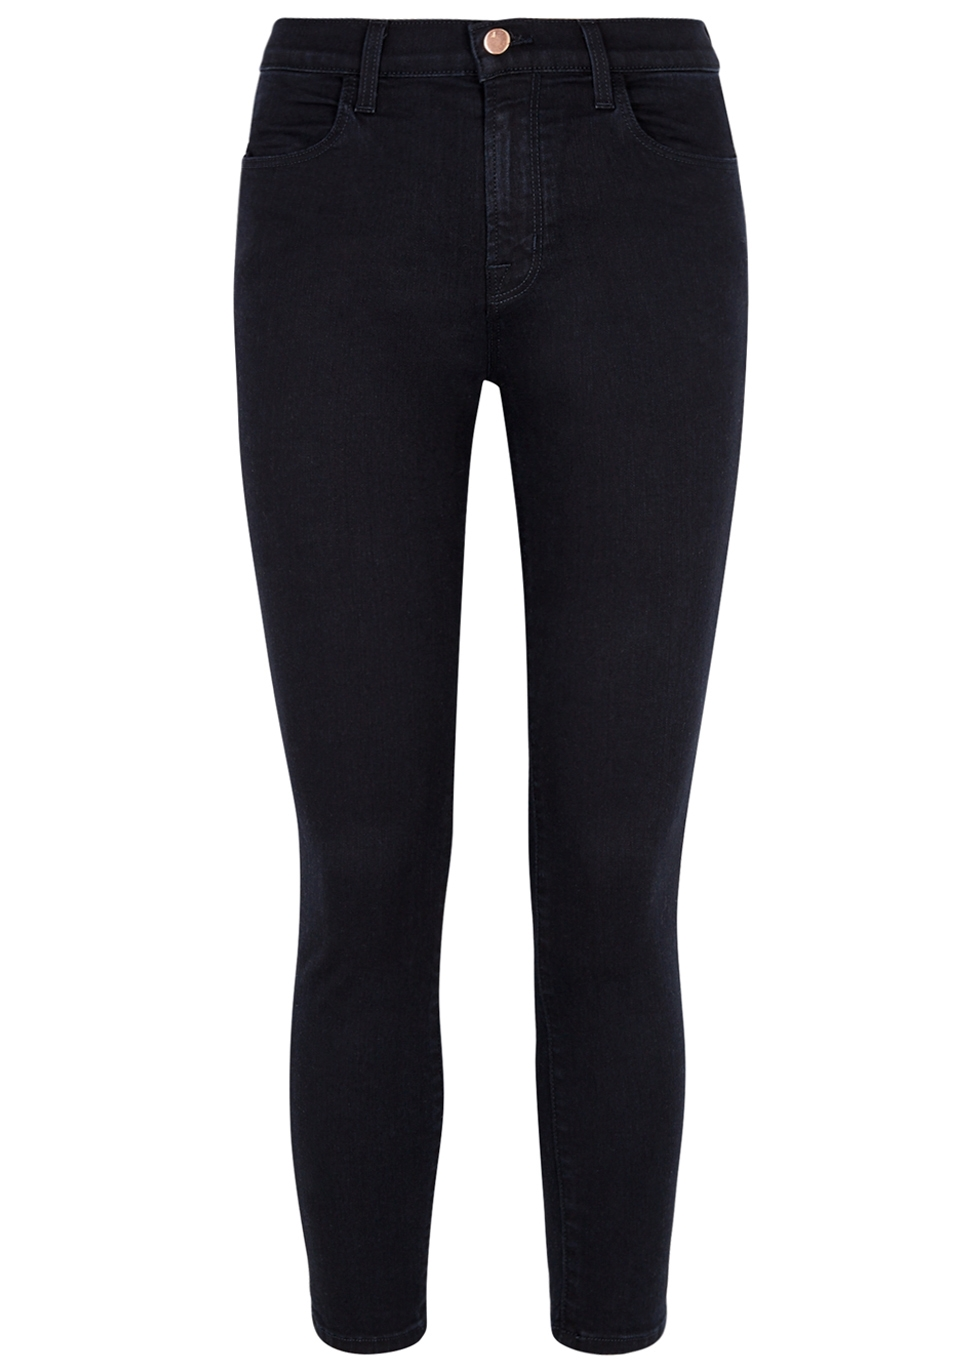 Alana indigo cropped skinny jeans